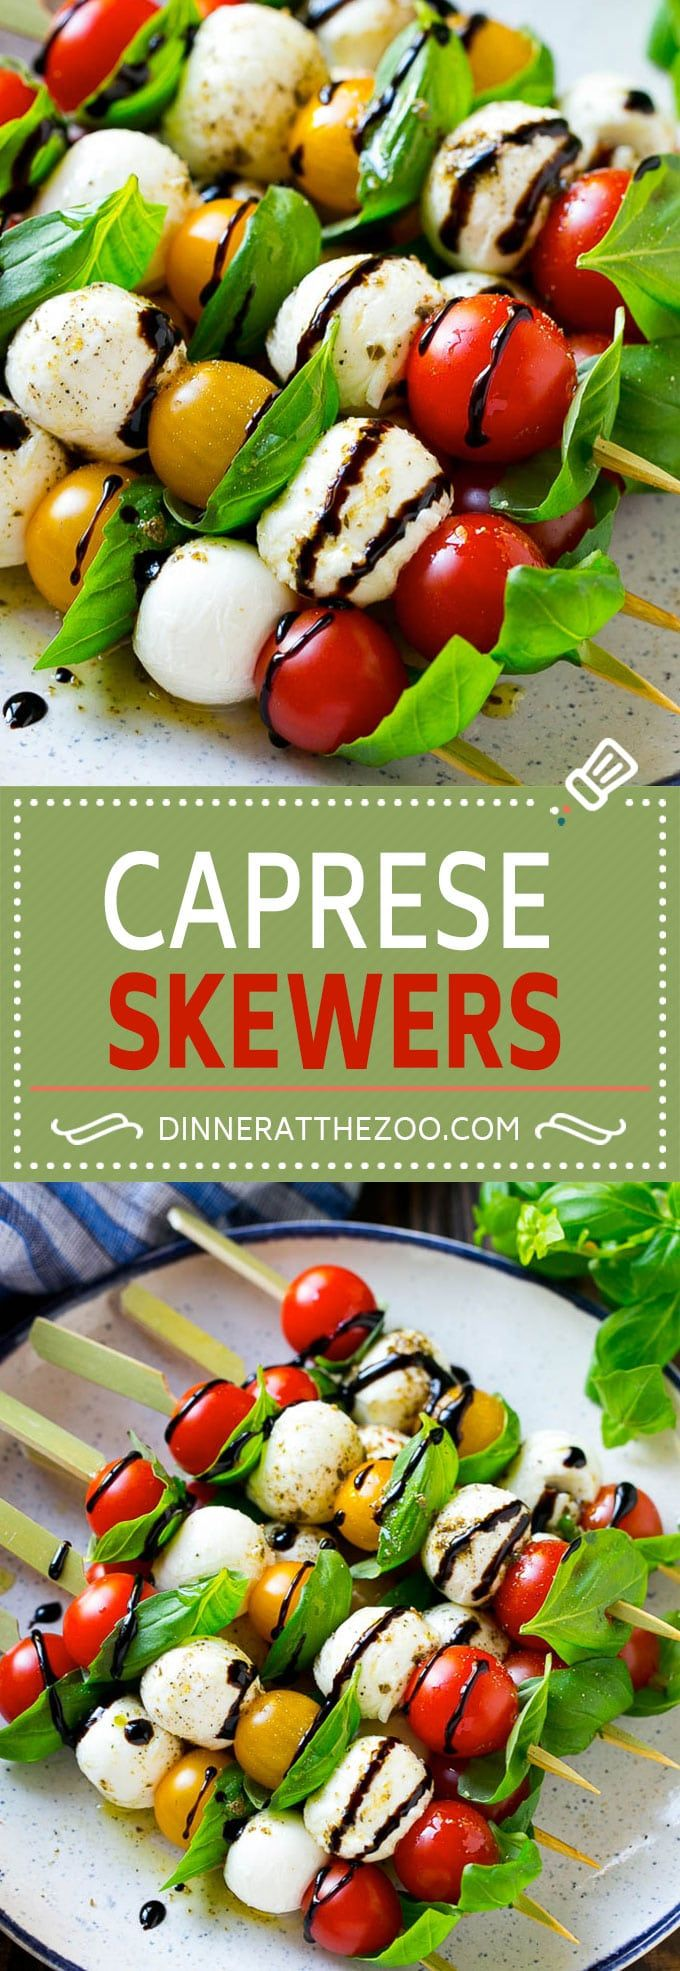 Caprese Skewers   Caprese Kabobs   Caprese Appetizer #rezepte #recipe #girlsnight #ladiesnight #maedelsabend #snack #fingerfood  #party #spiess #sticks #fingerfoodpartyappetizers